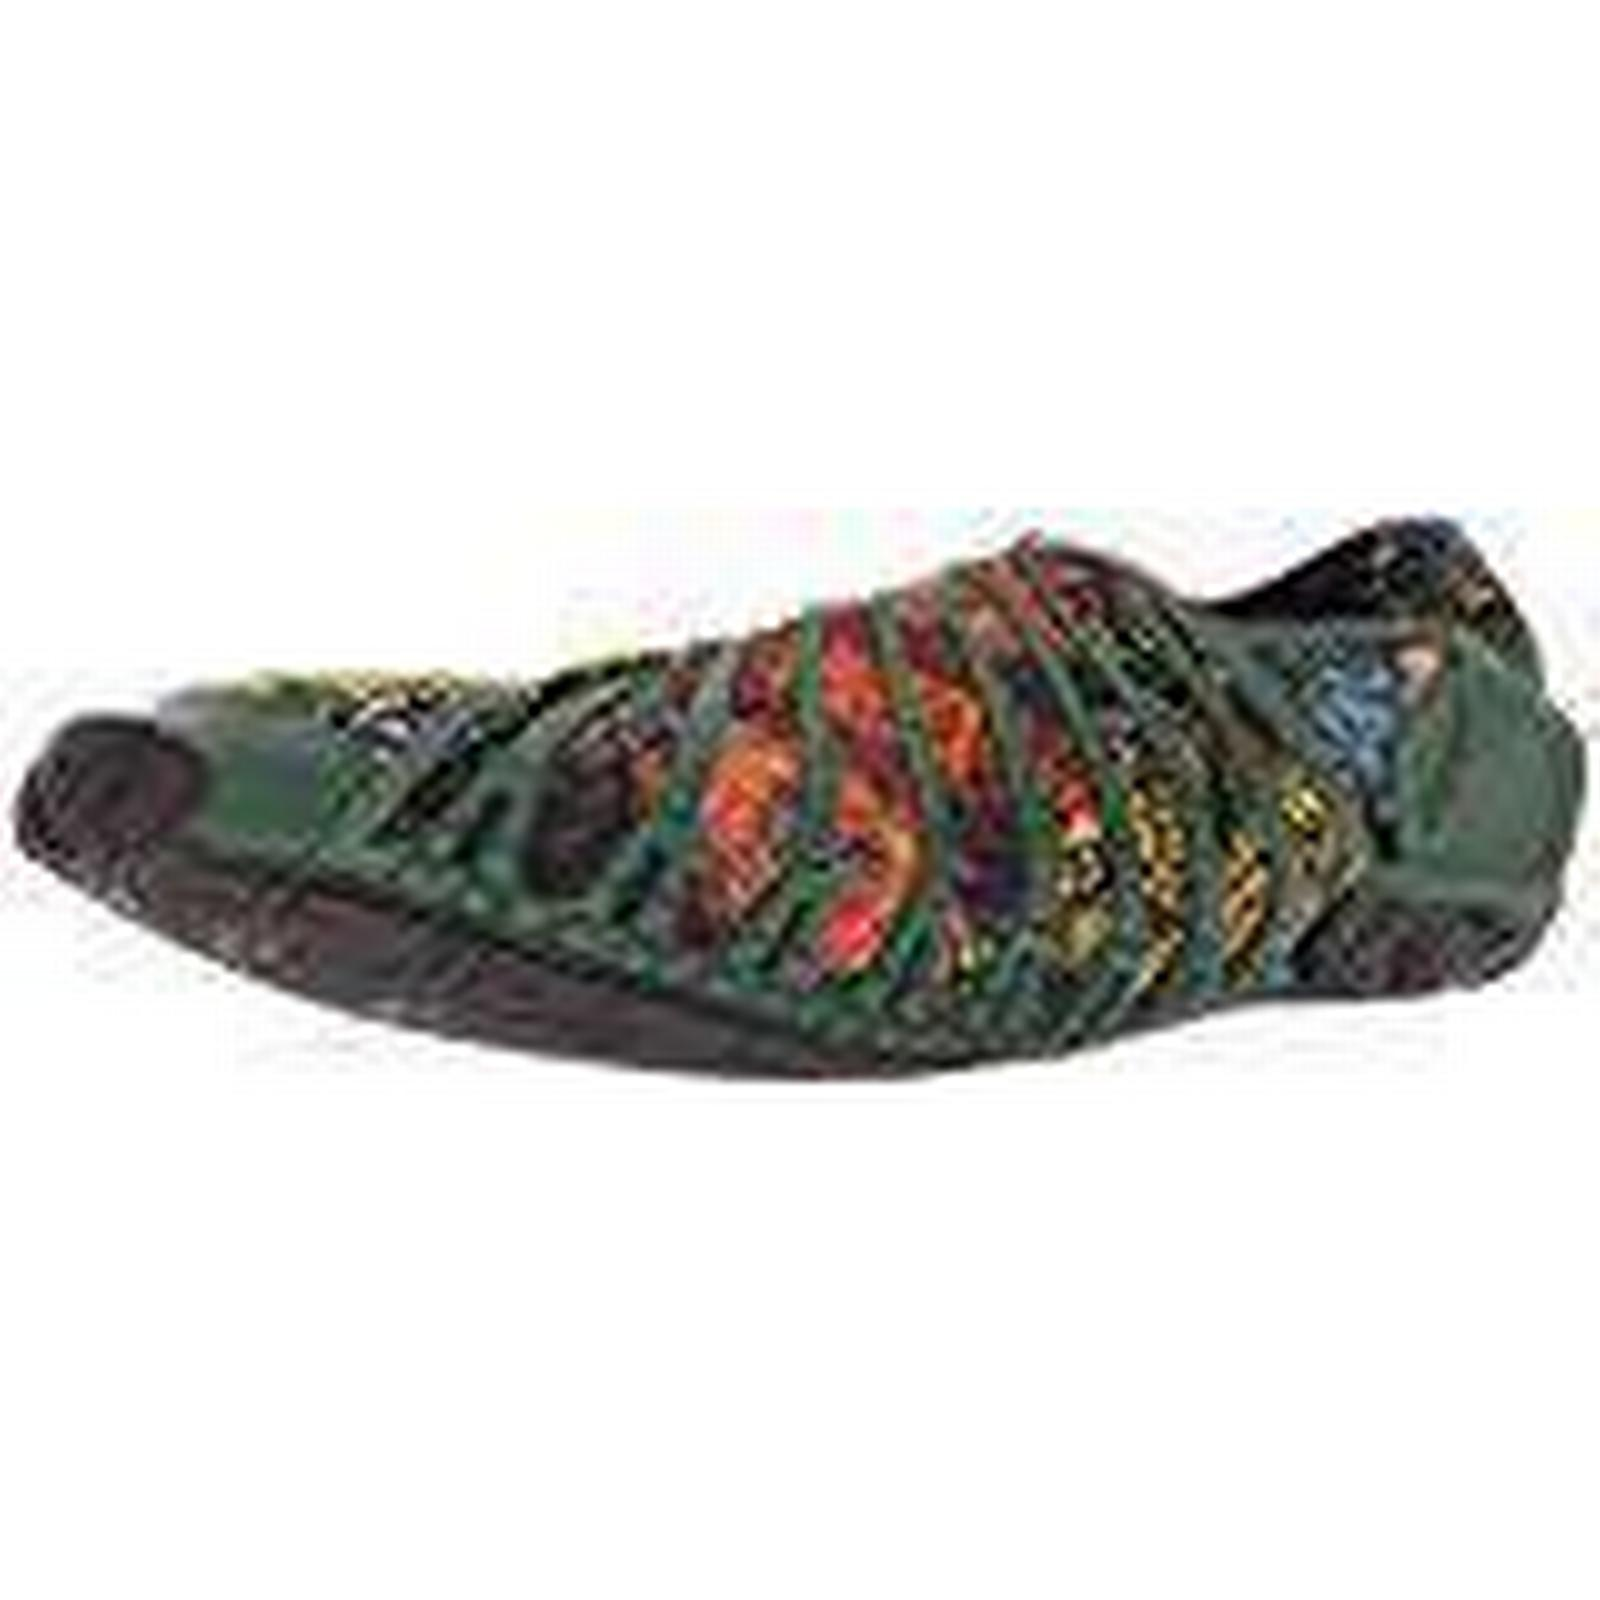 Vibram Script, FiveFingers Men''s Furoshiki Original Low-Top Sneakers, Multicolour Desert Script, Vibram 10.5/11 UK 10.5/11 UK 0e1aa2